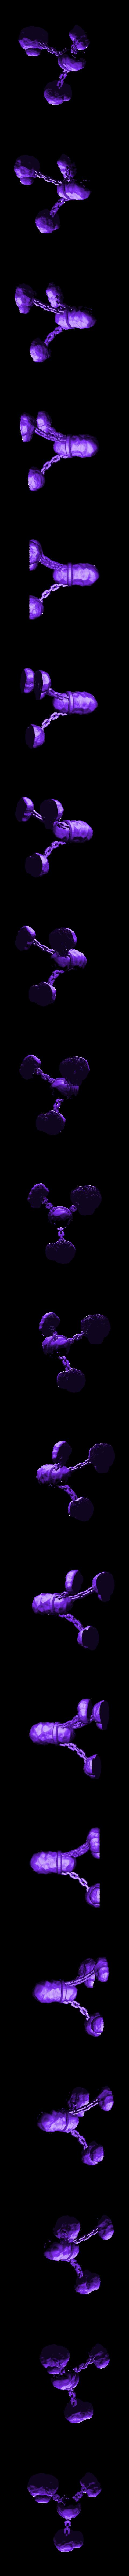 ChainedRock.stl Download free STL file Floating Rock • 3D printer template, daandruff